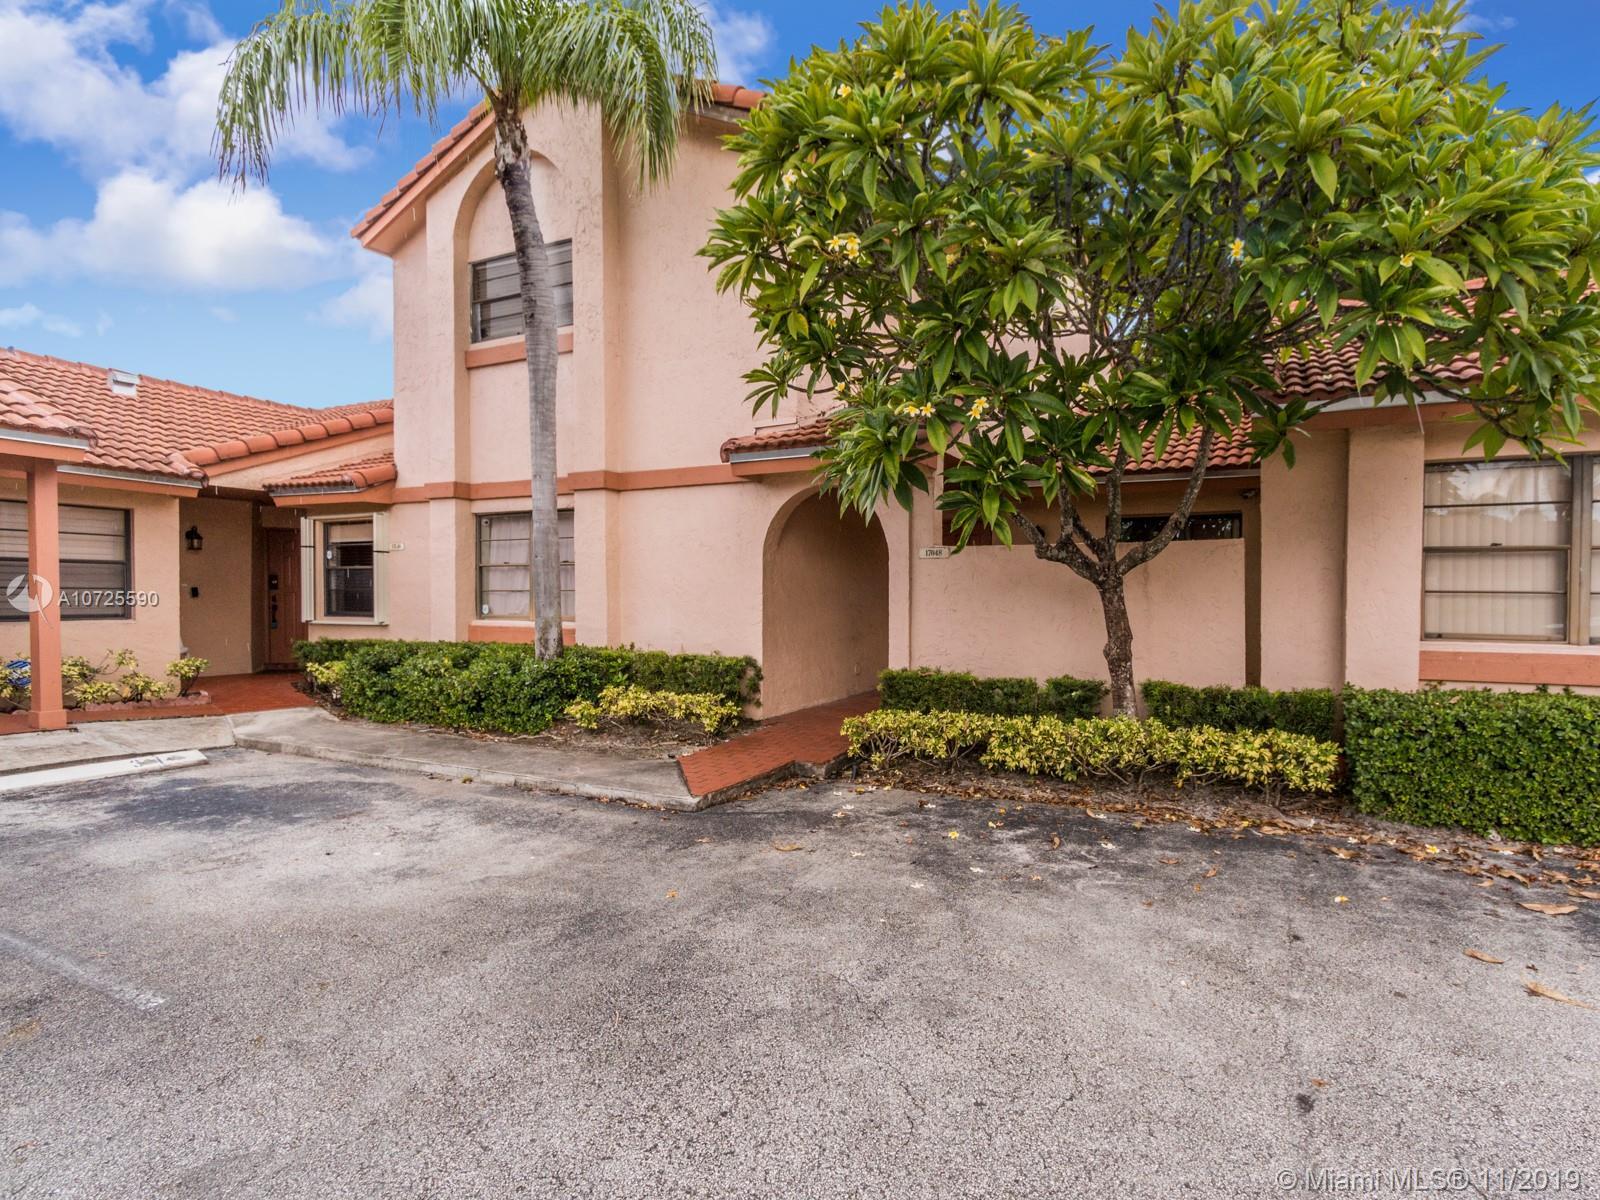 17048 NW 66th Ct, Hialeah, FL 33015 - Hialeah, FL real estate listing